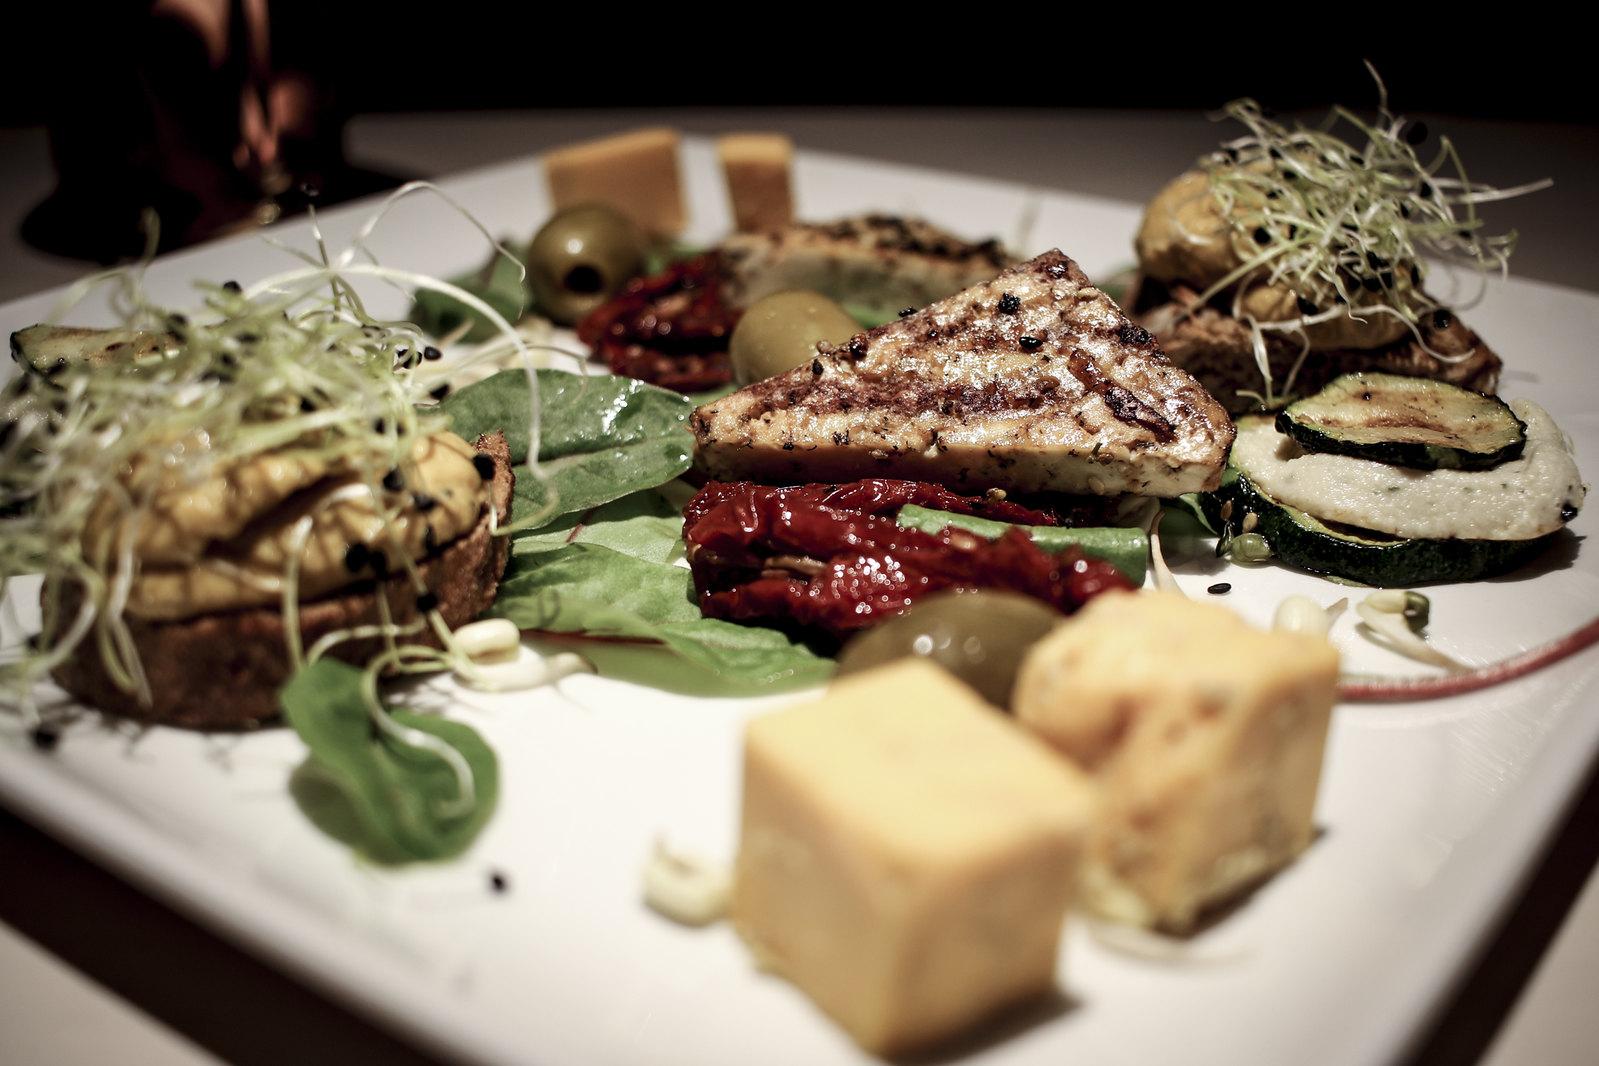 vegan restoran v, vegan snack platter